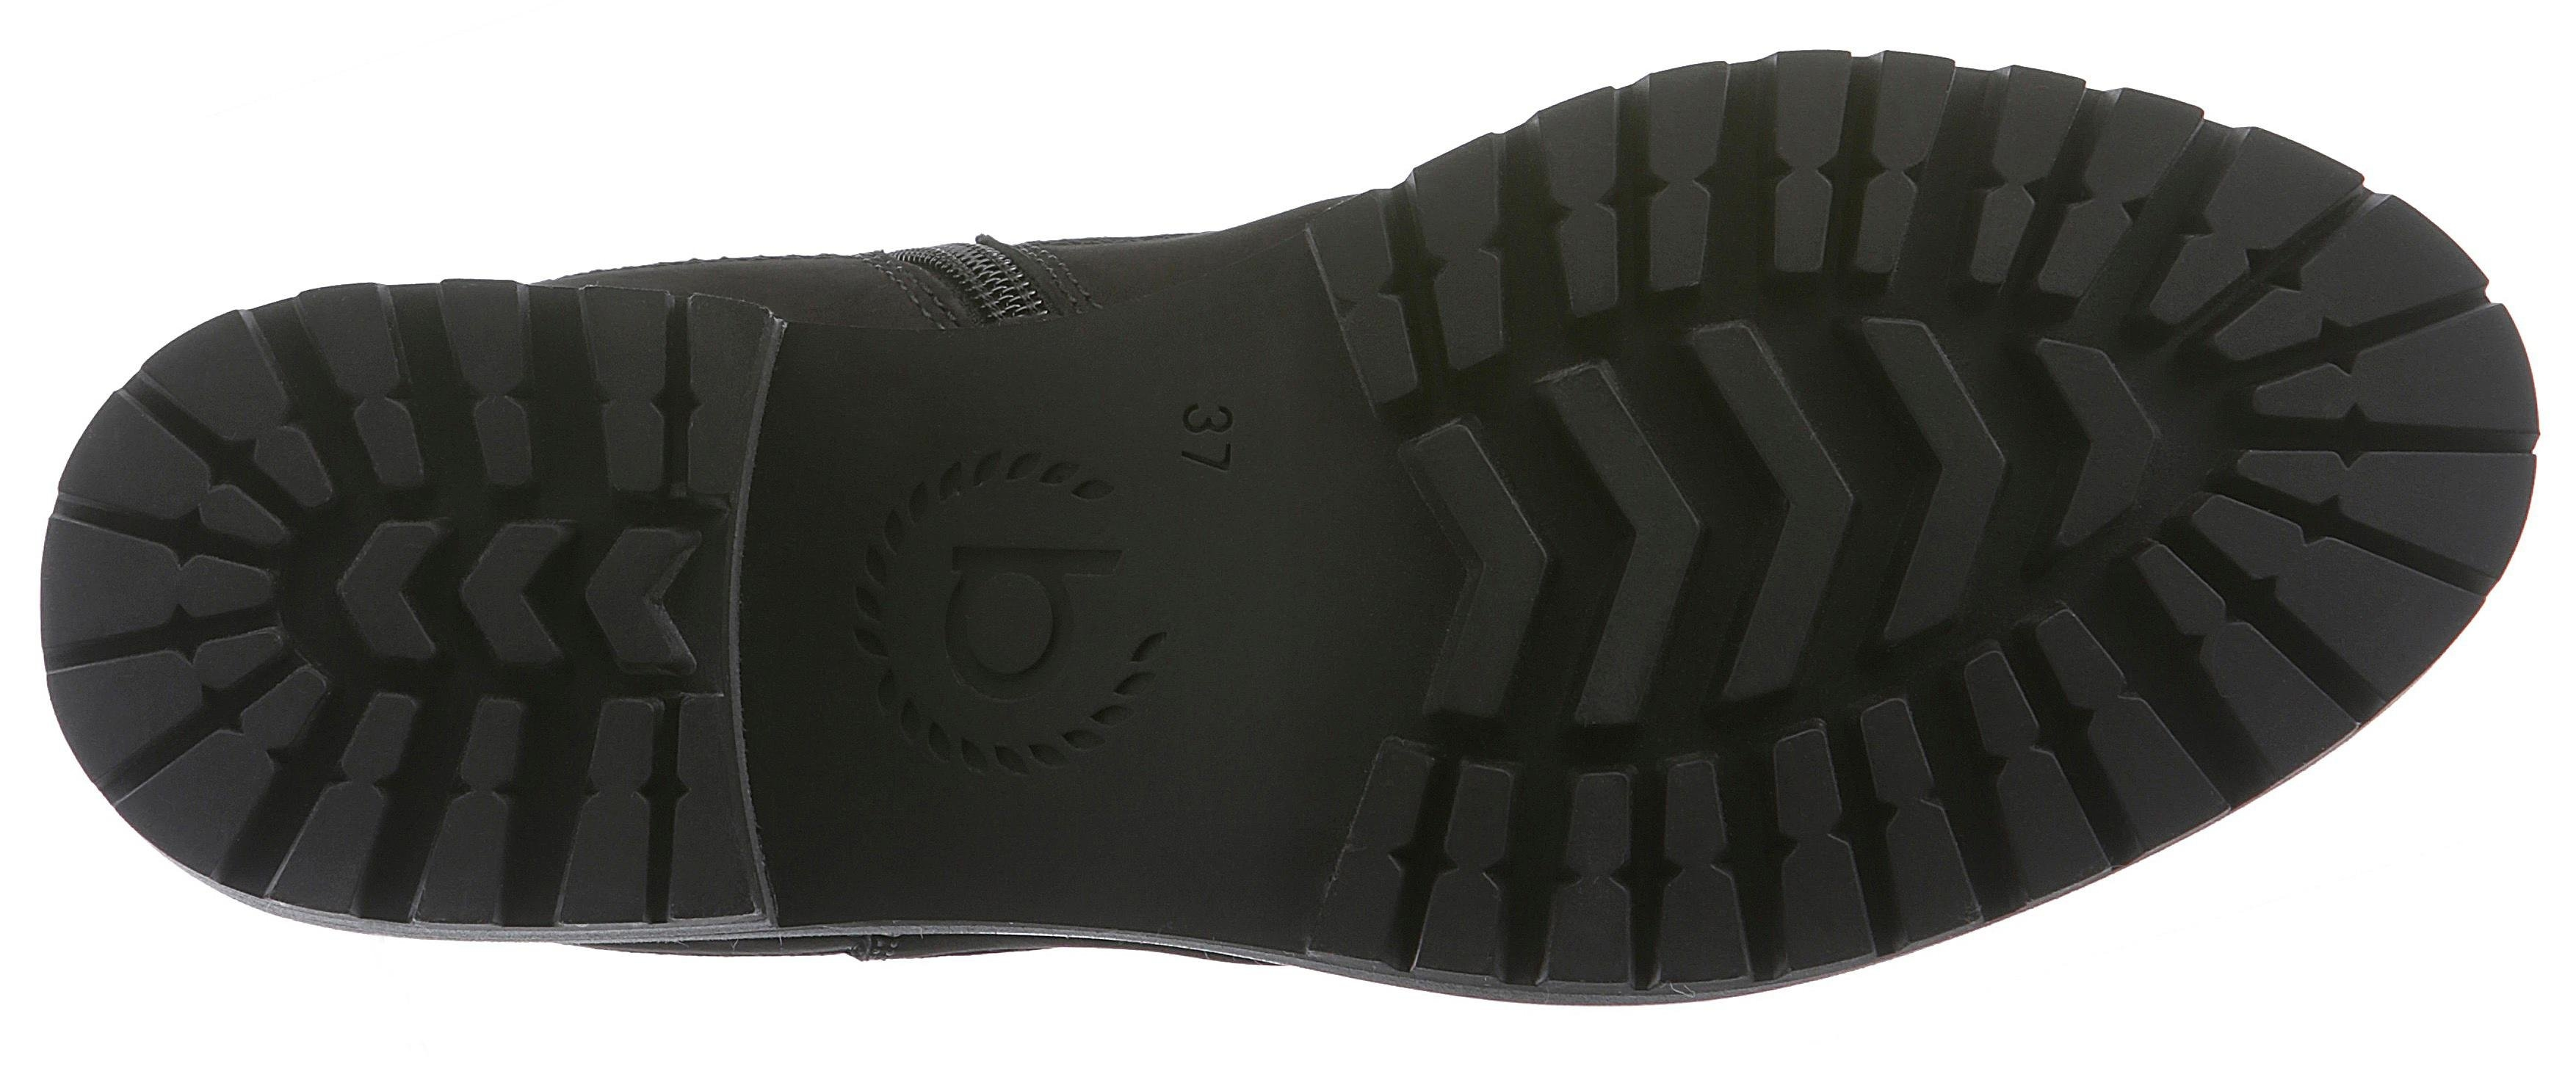 boots Chelsea Online Nu Bestellen Bugatti DW9H2EYI